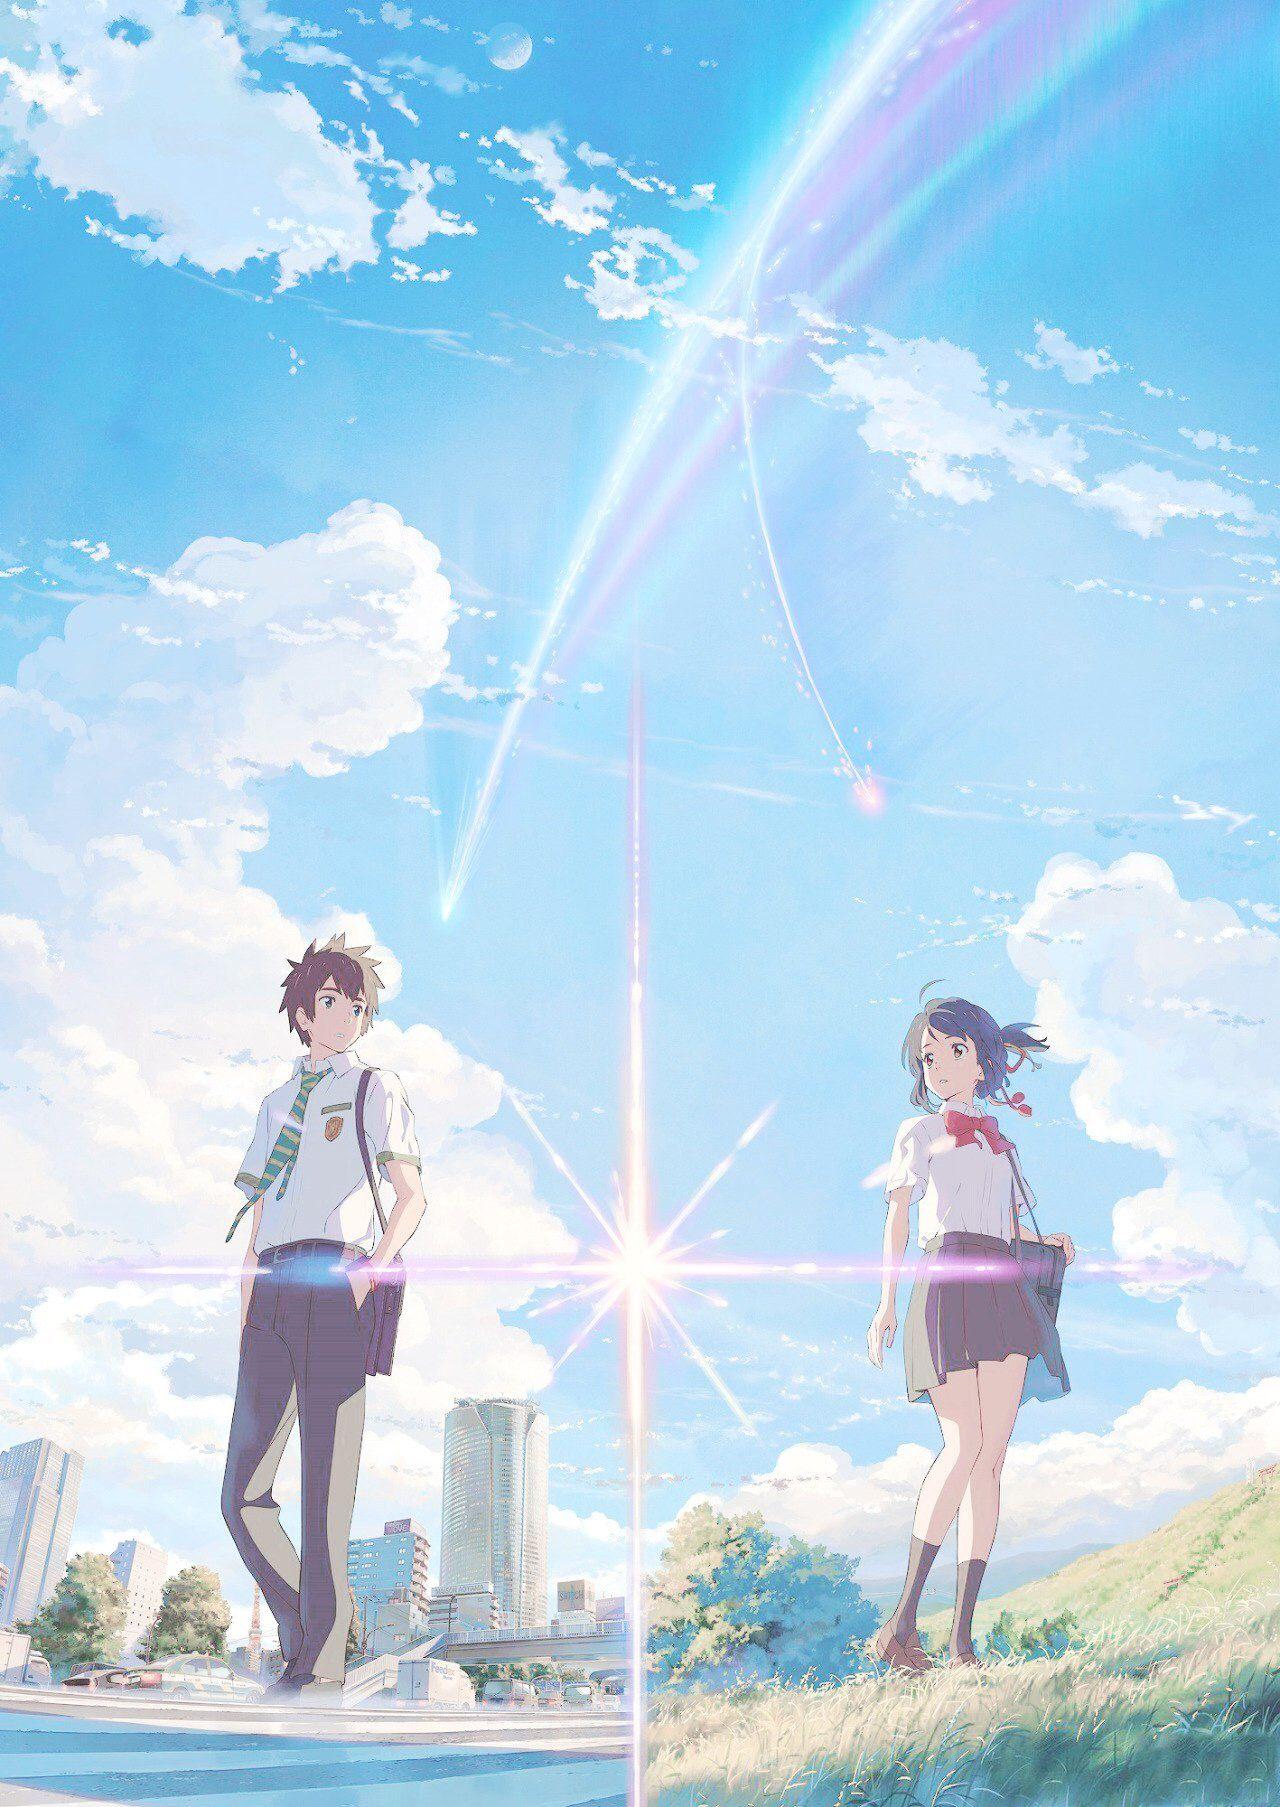 Pin oleh Hootsil di Anime & Manga Gambar anime, Karya